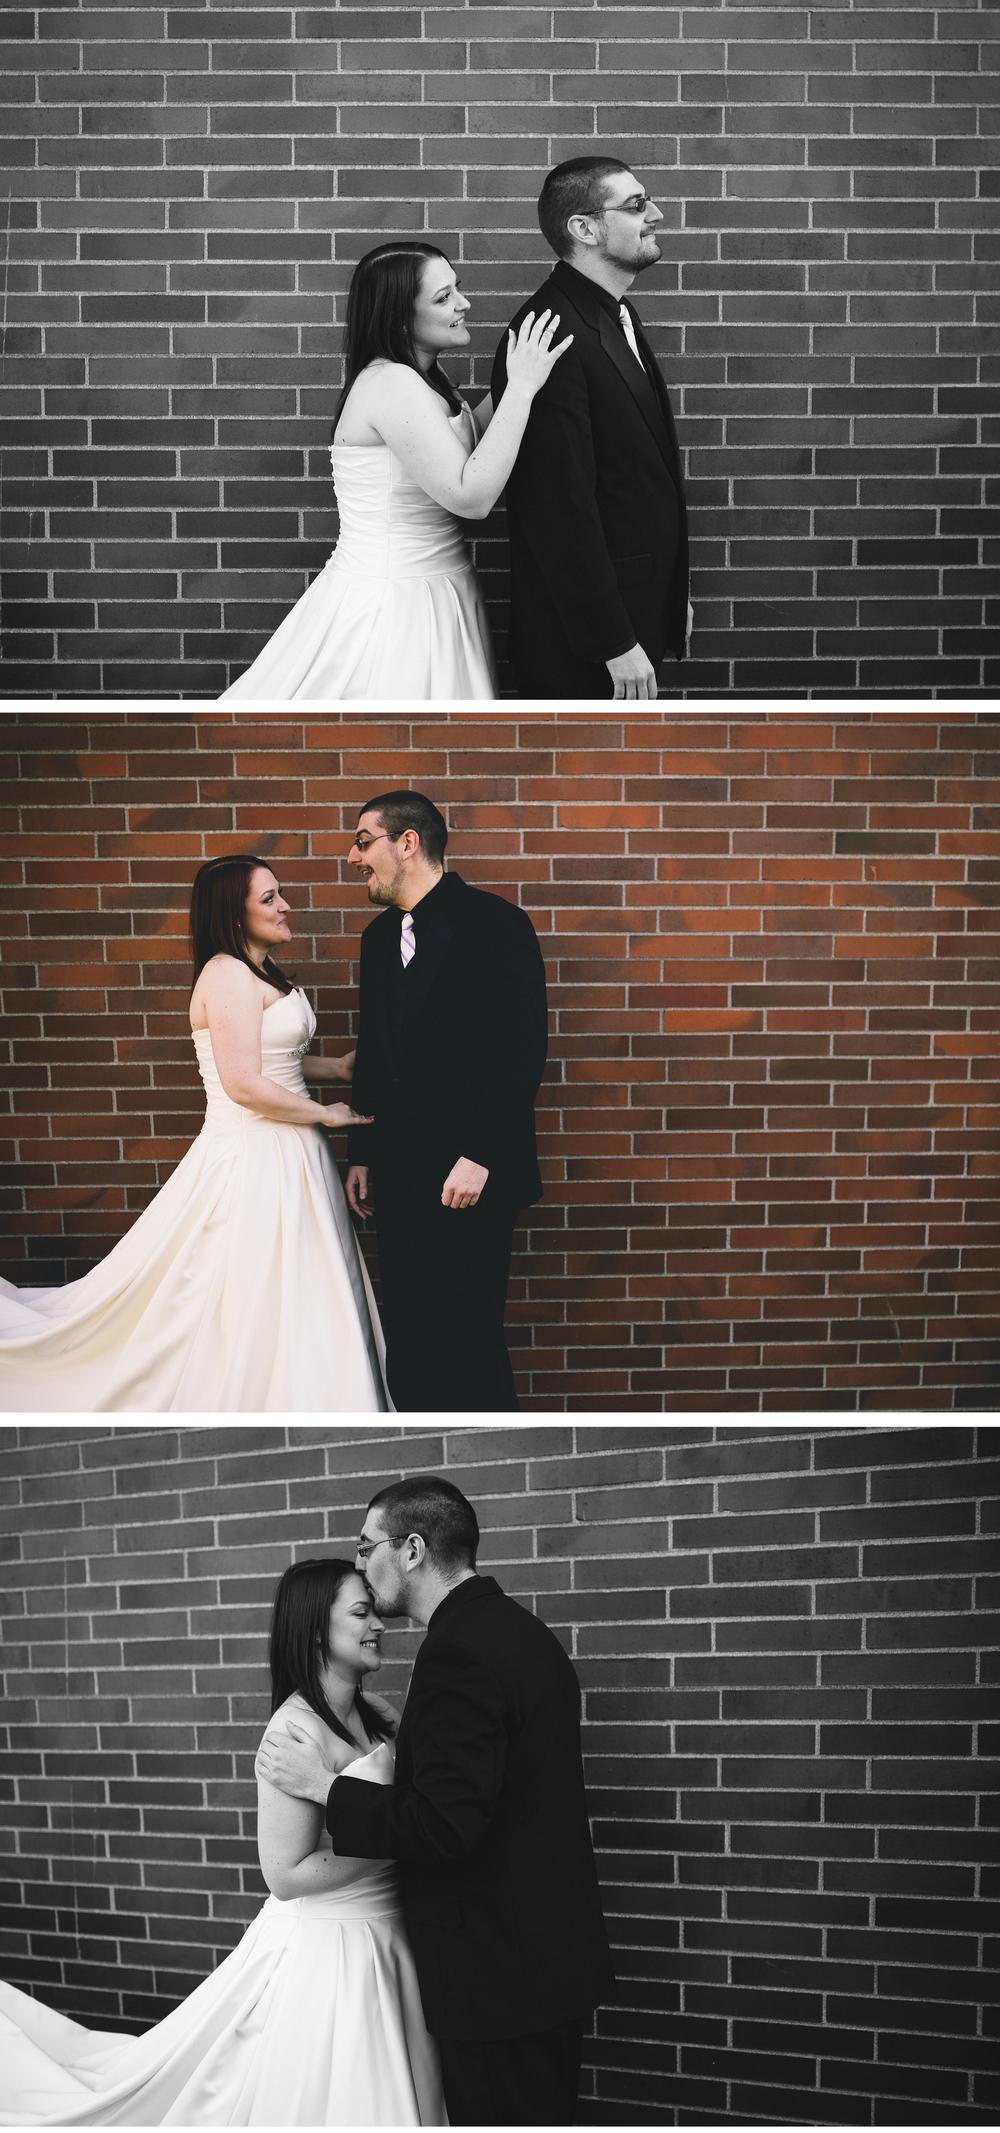 Eklund-Wedding-Quest-Church-11.jpg